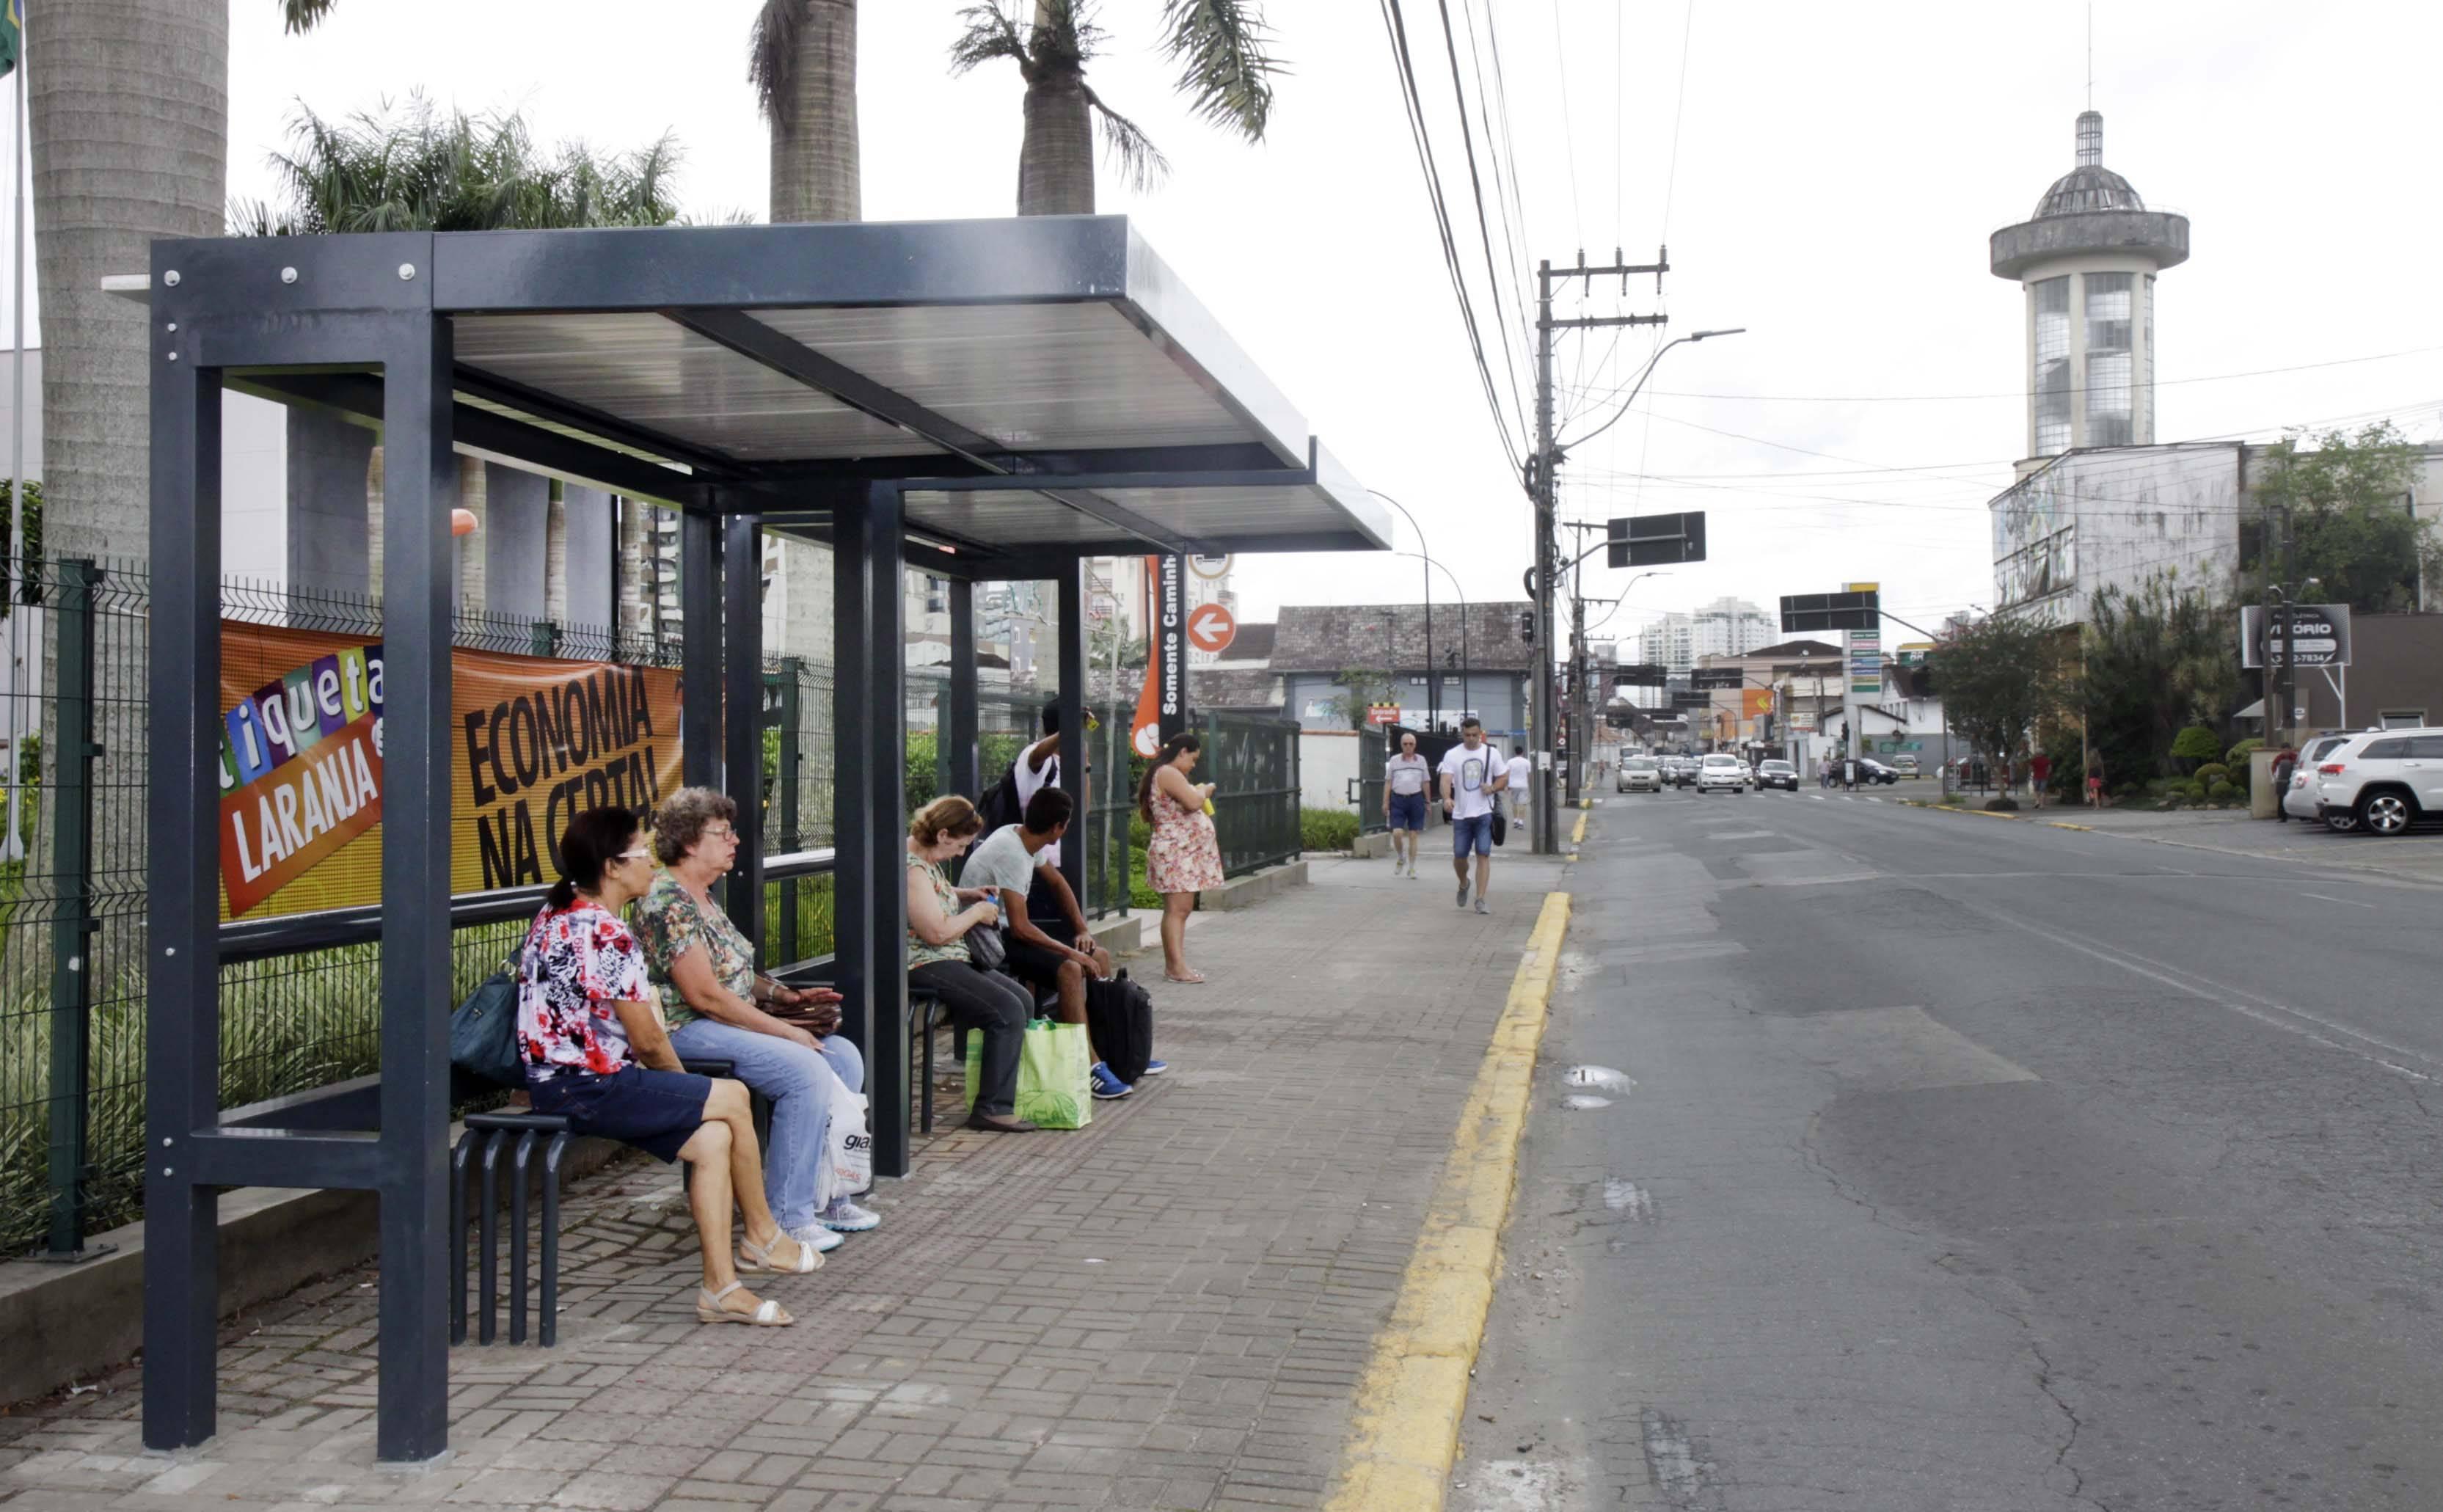 Prefeitura de Joinville instala novos abrigos de ônibus 717790c1a19d